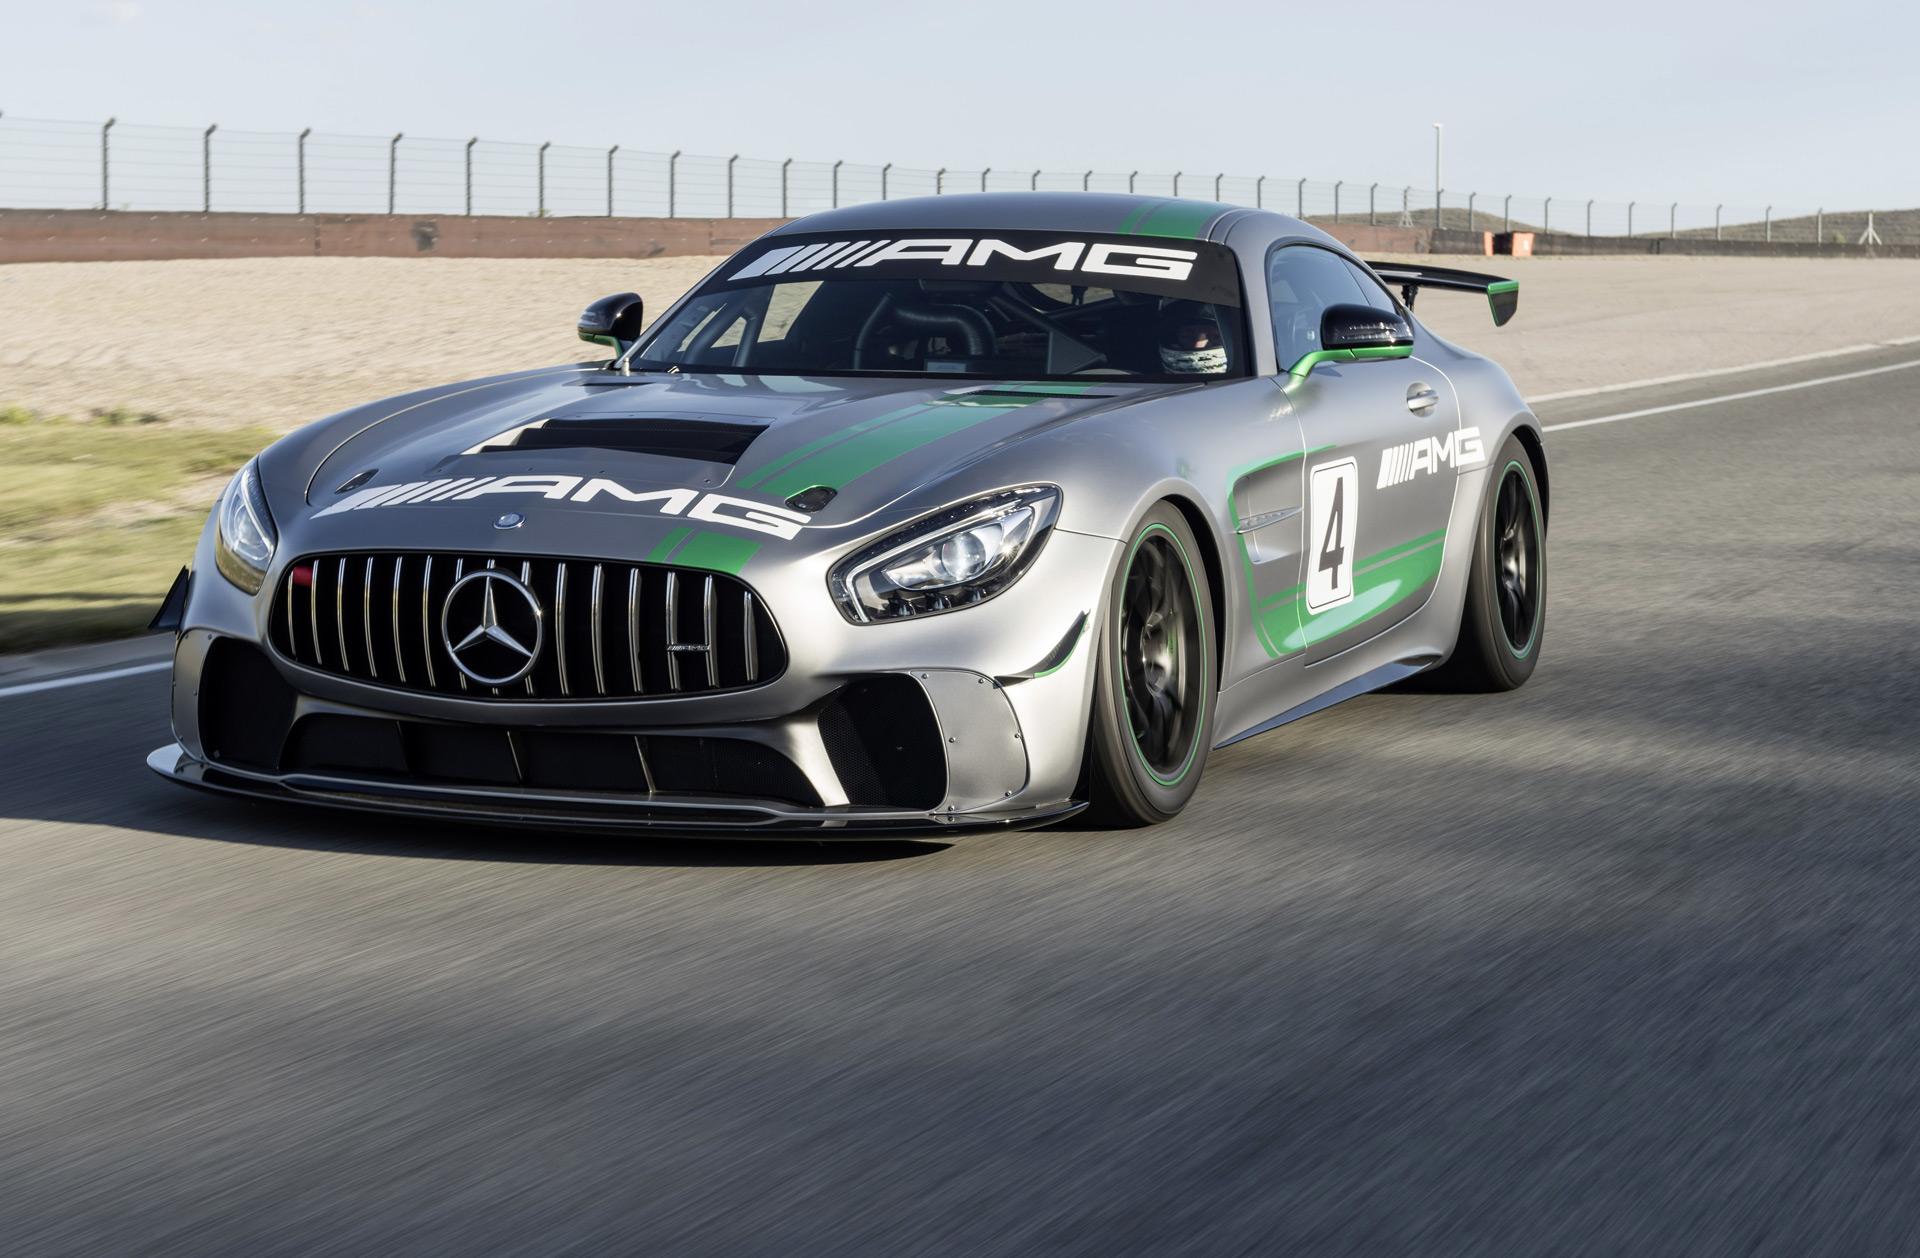 Mercedes-AMG reveals GT4 race car